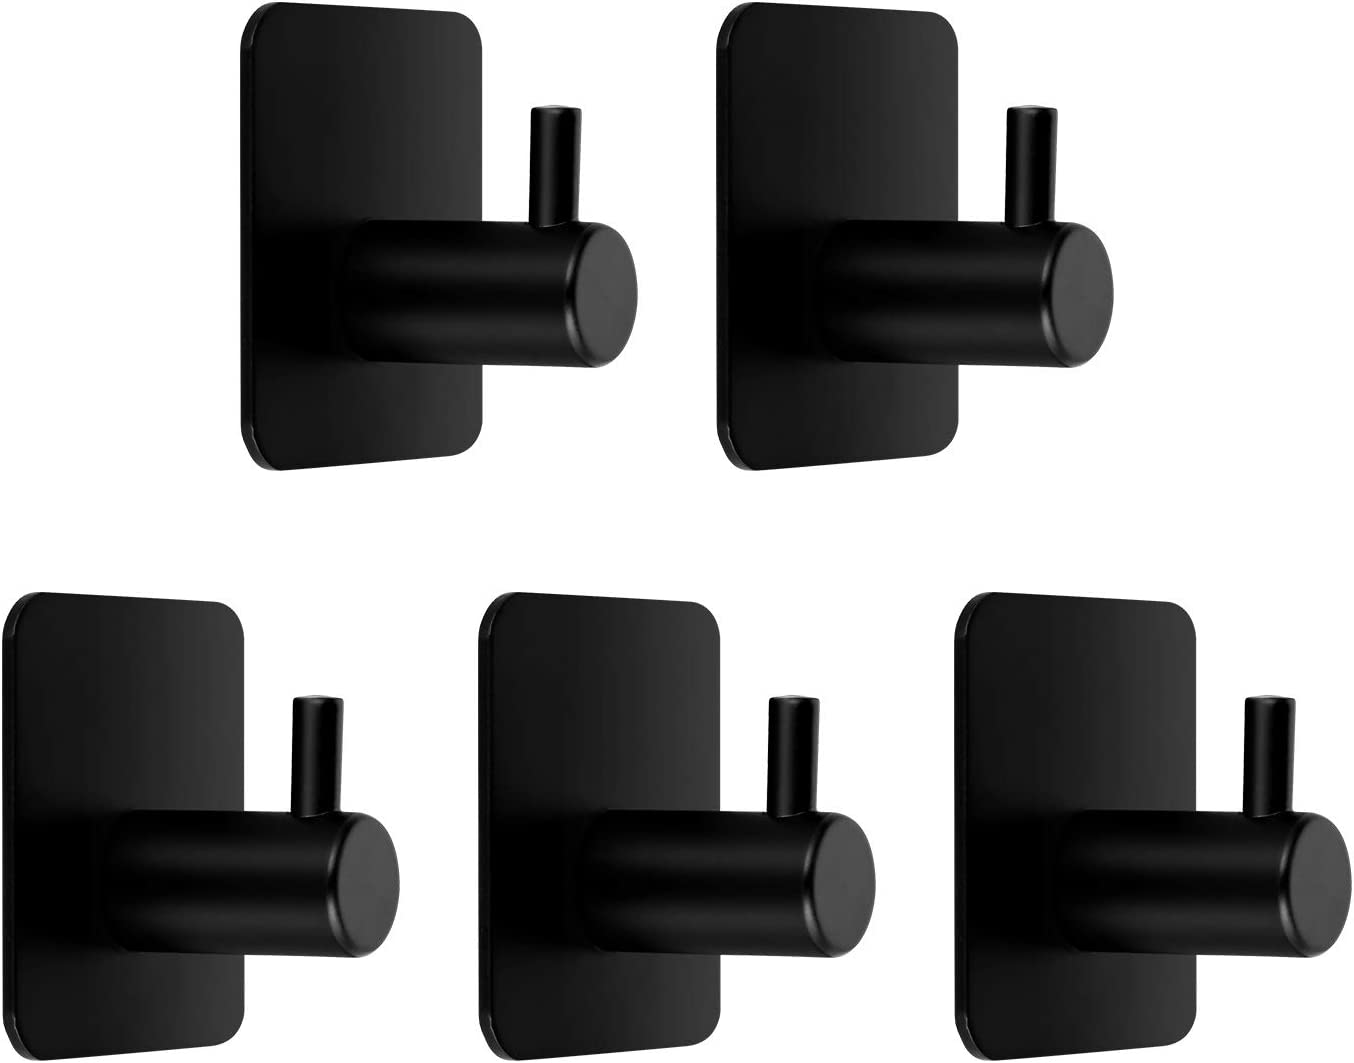 HELKKMOBathroom Wall HooksHeavy-Duty 66lb (MAX) NailFree Wall HangersHooksStick onHooks, 304 Stainless Steel Hooks Used for OfficeHome Kitchen and Bedroom WardrobesBlack5 Packs